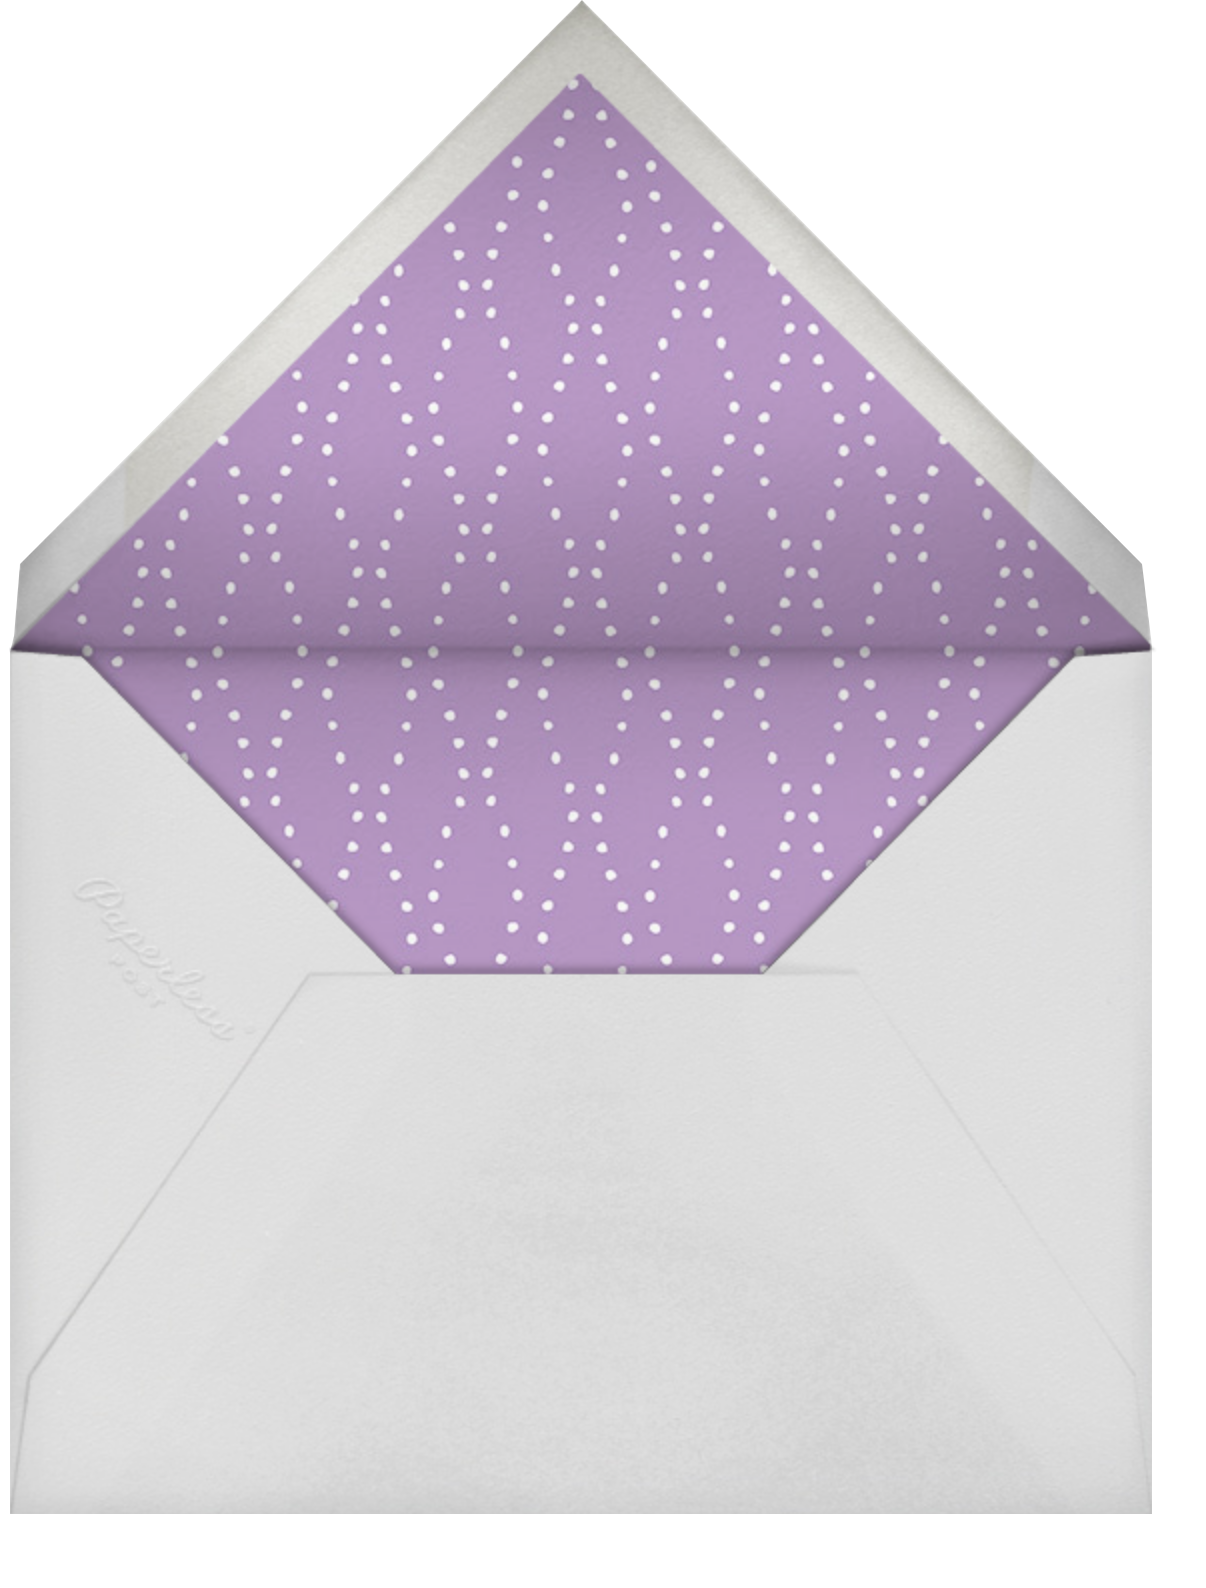 Assorted Eggs - Paperless Post - Easter - envelope back